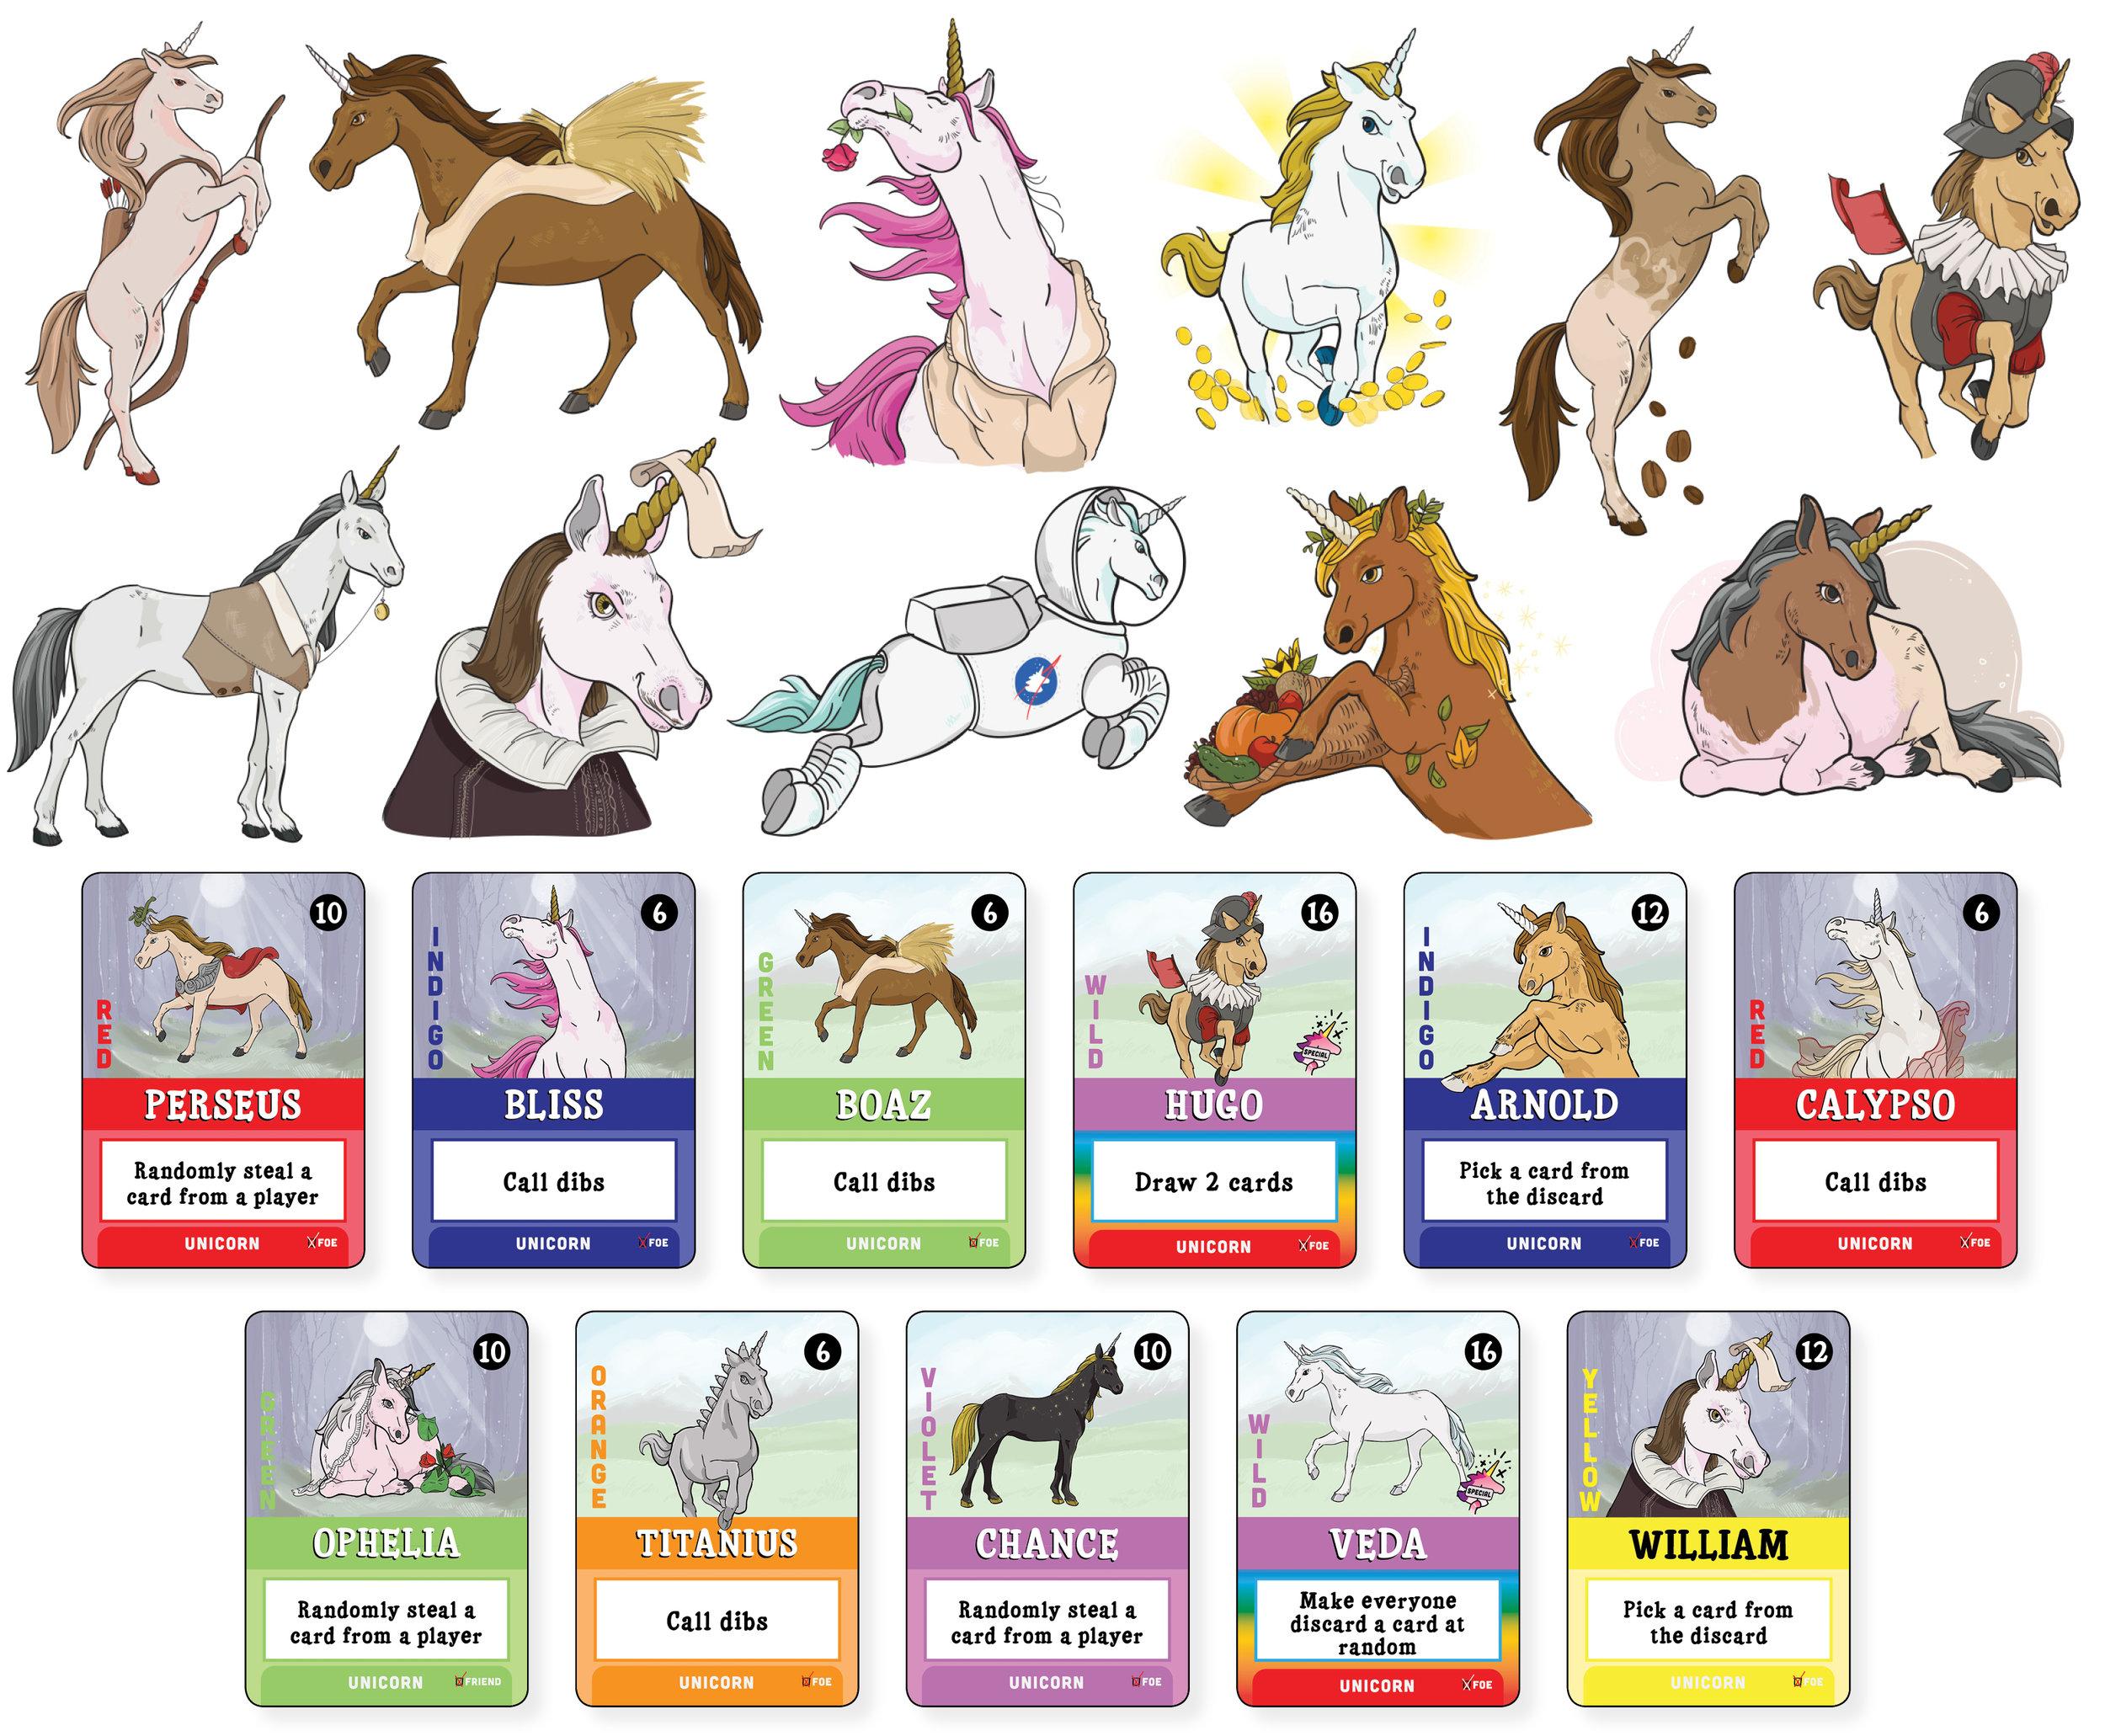 Final artwork for Unicorns Friend or Foe: Foe Edition included 36 styled unicorns.